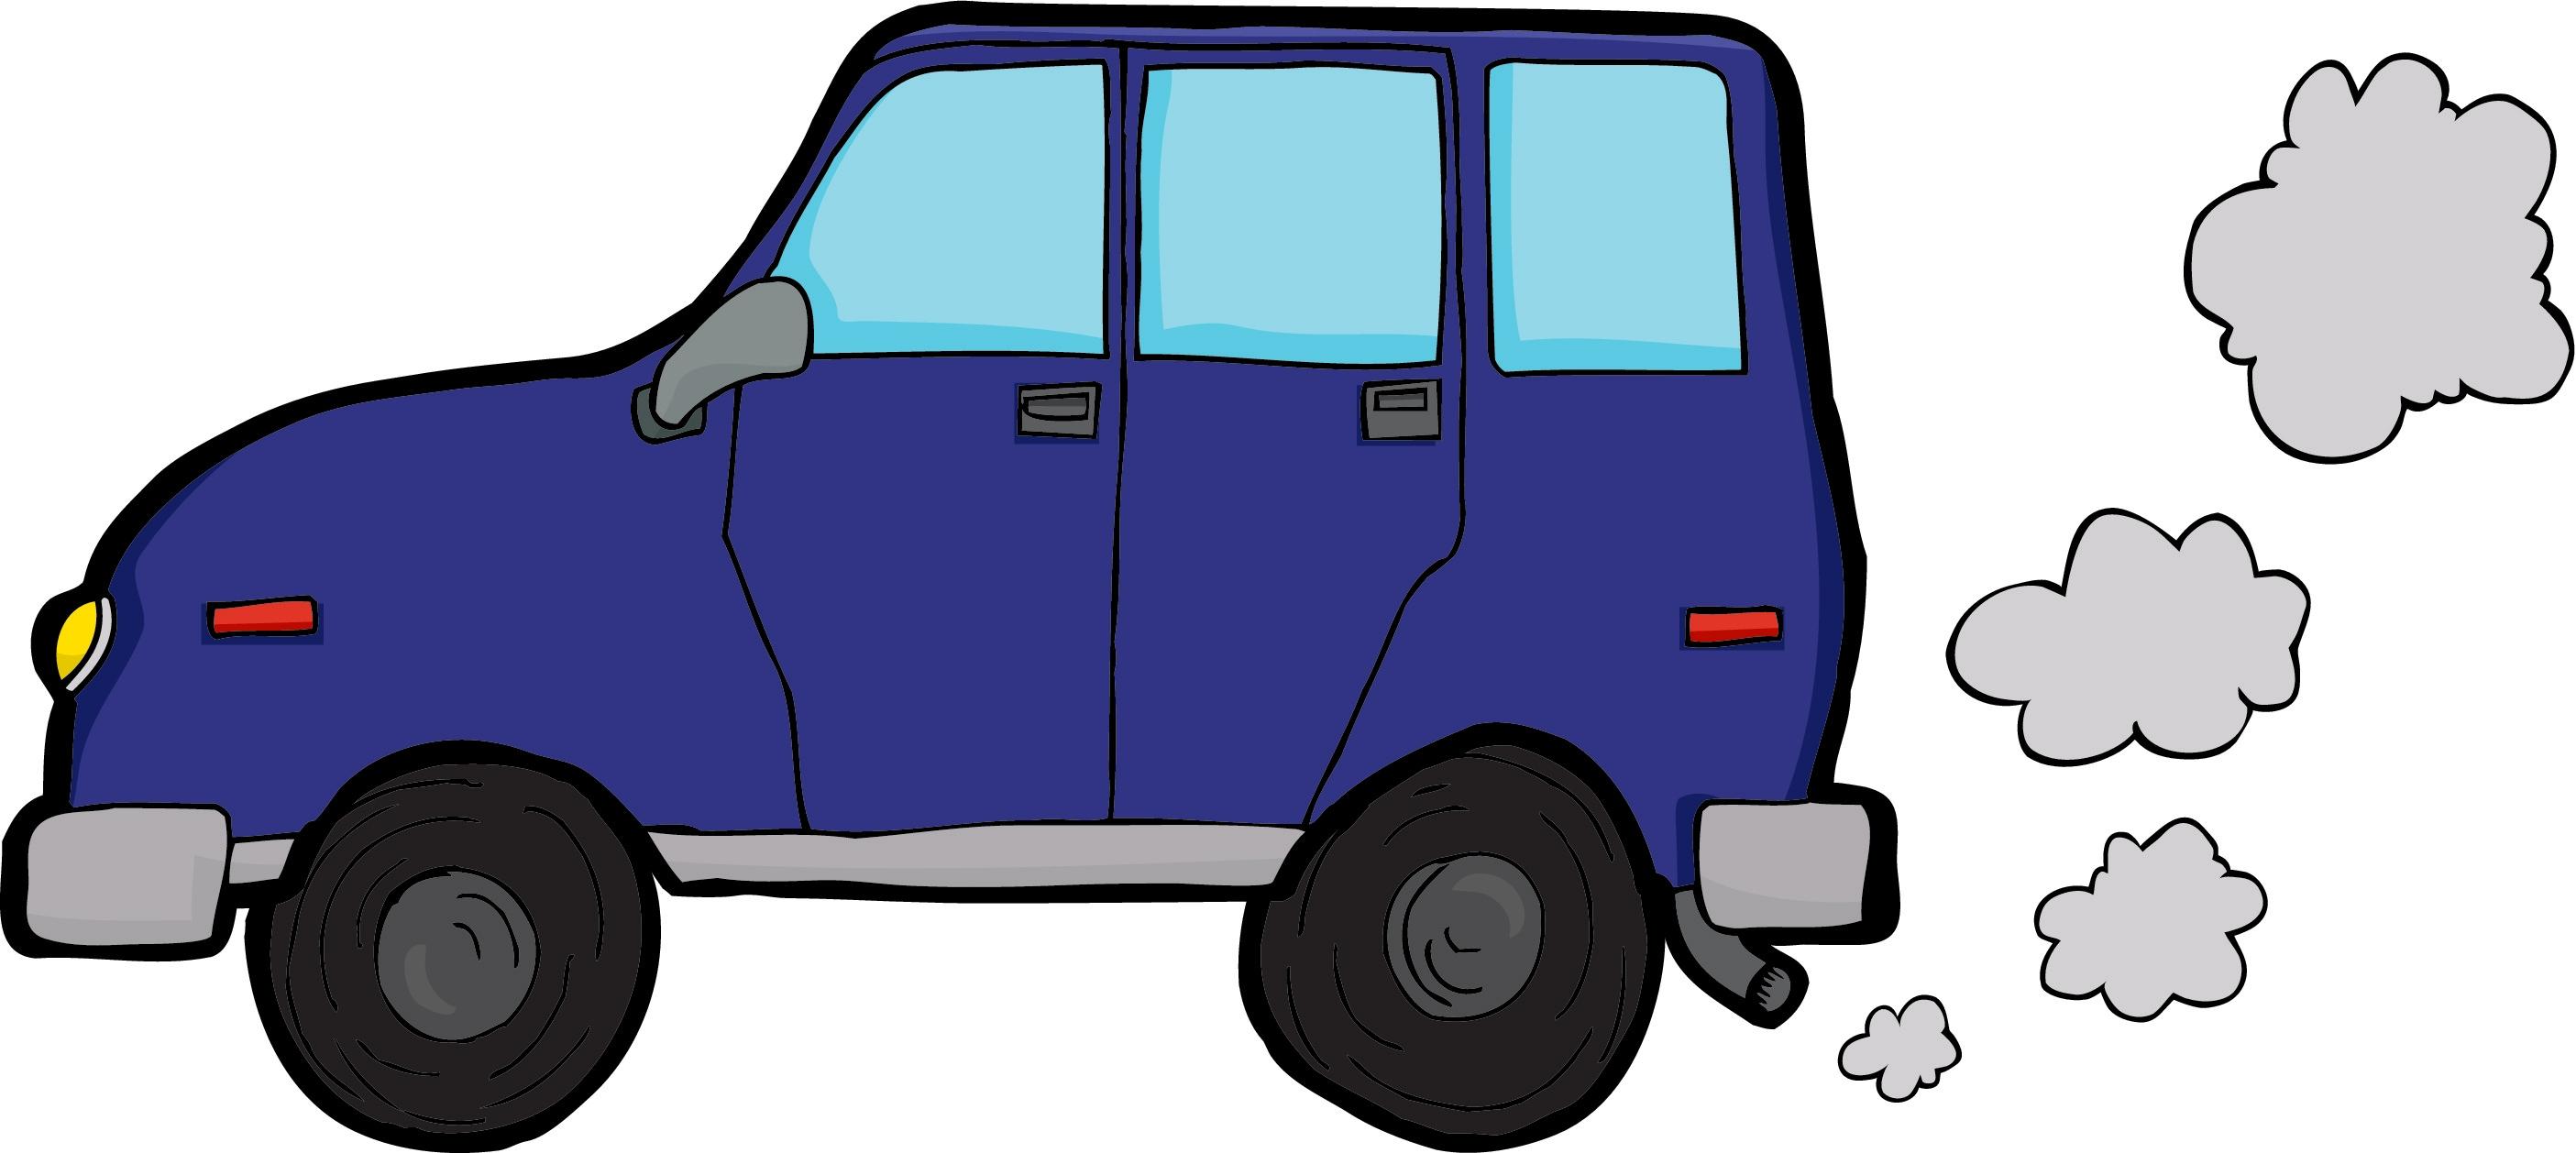 Blue Car clipart car smoke Car 2 Smoke Official Clipart